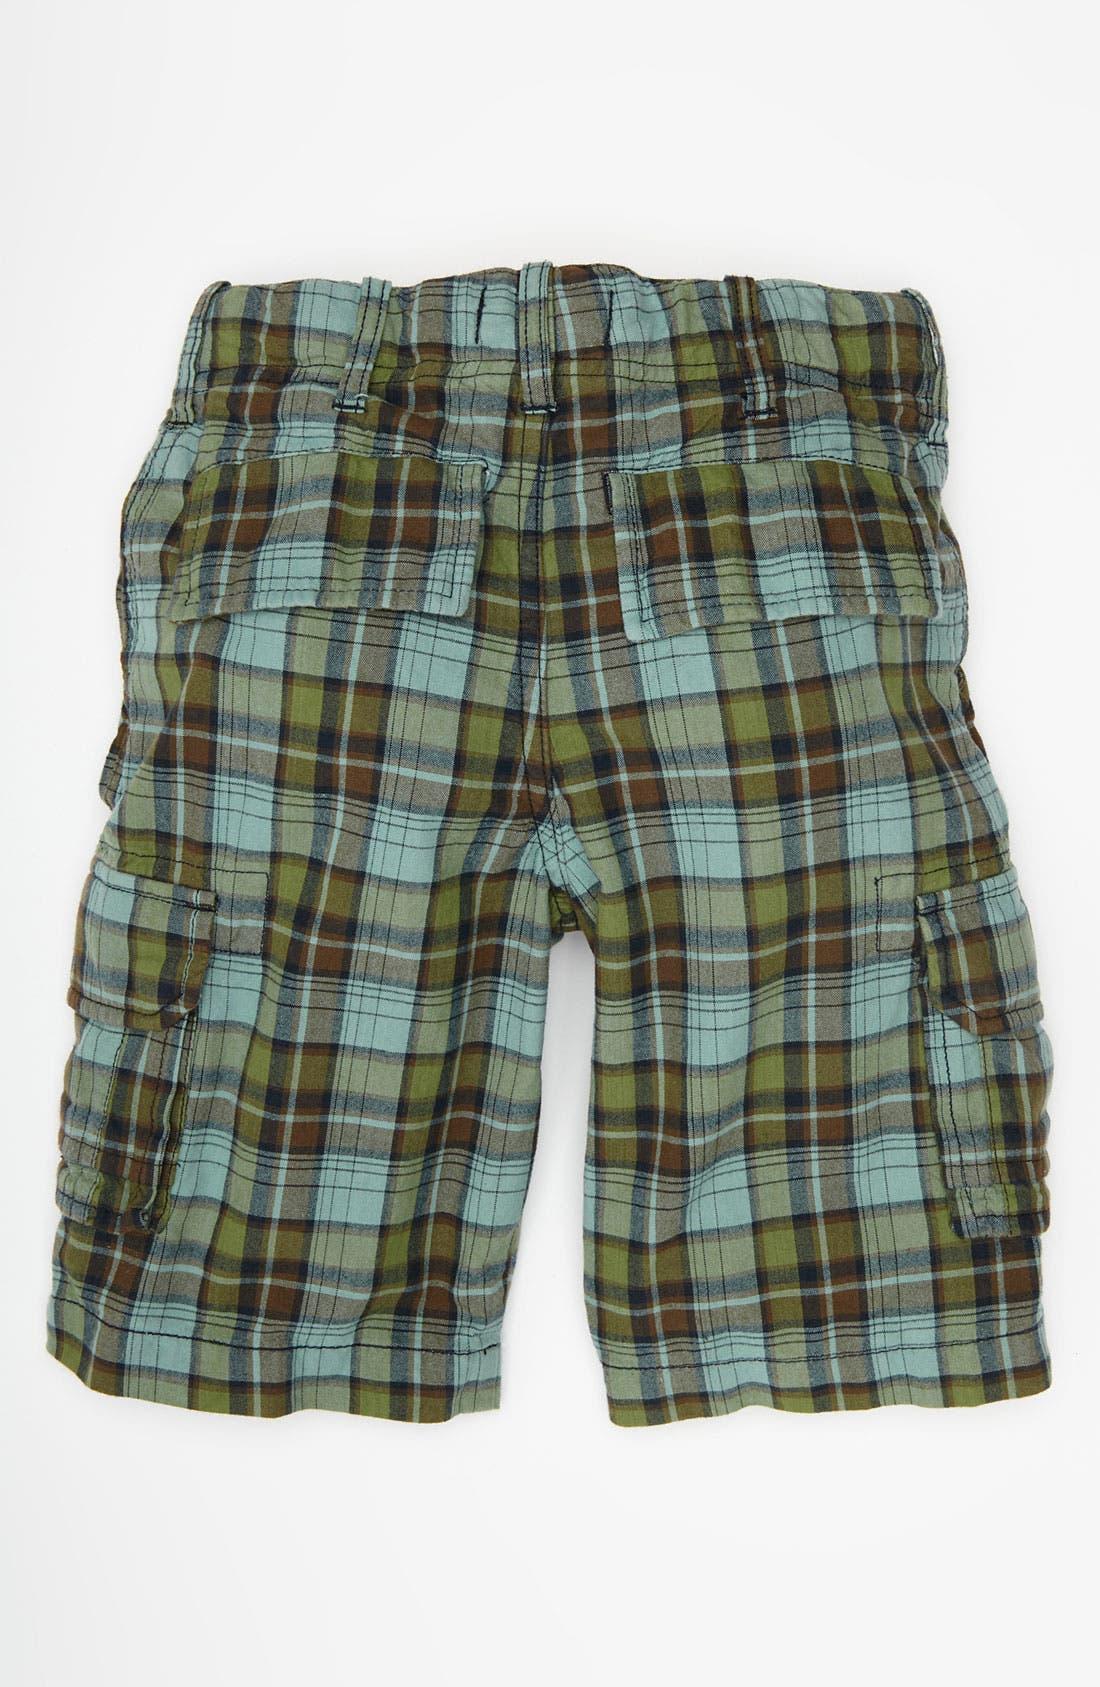 Alternate Image 2  - Peek 'Havasu' Trail Shorts (Toddler, Little Boys & Big Boys)